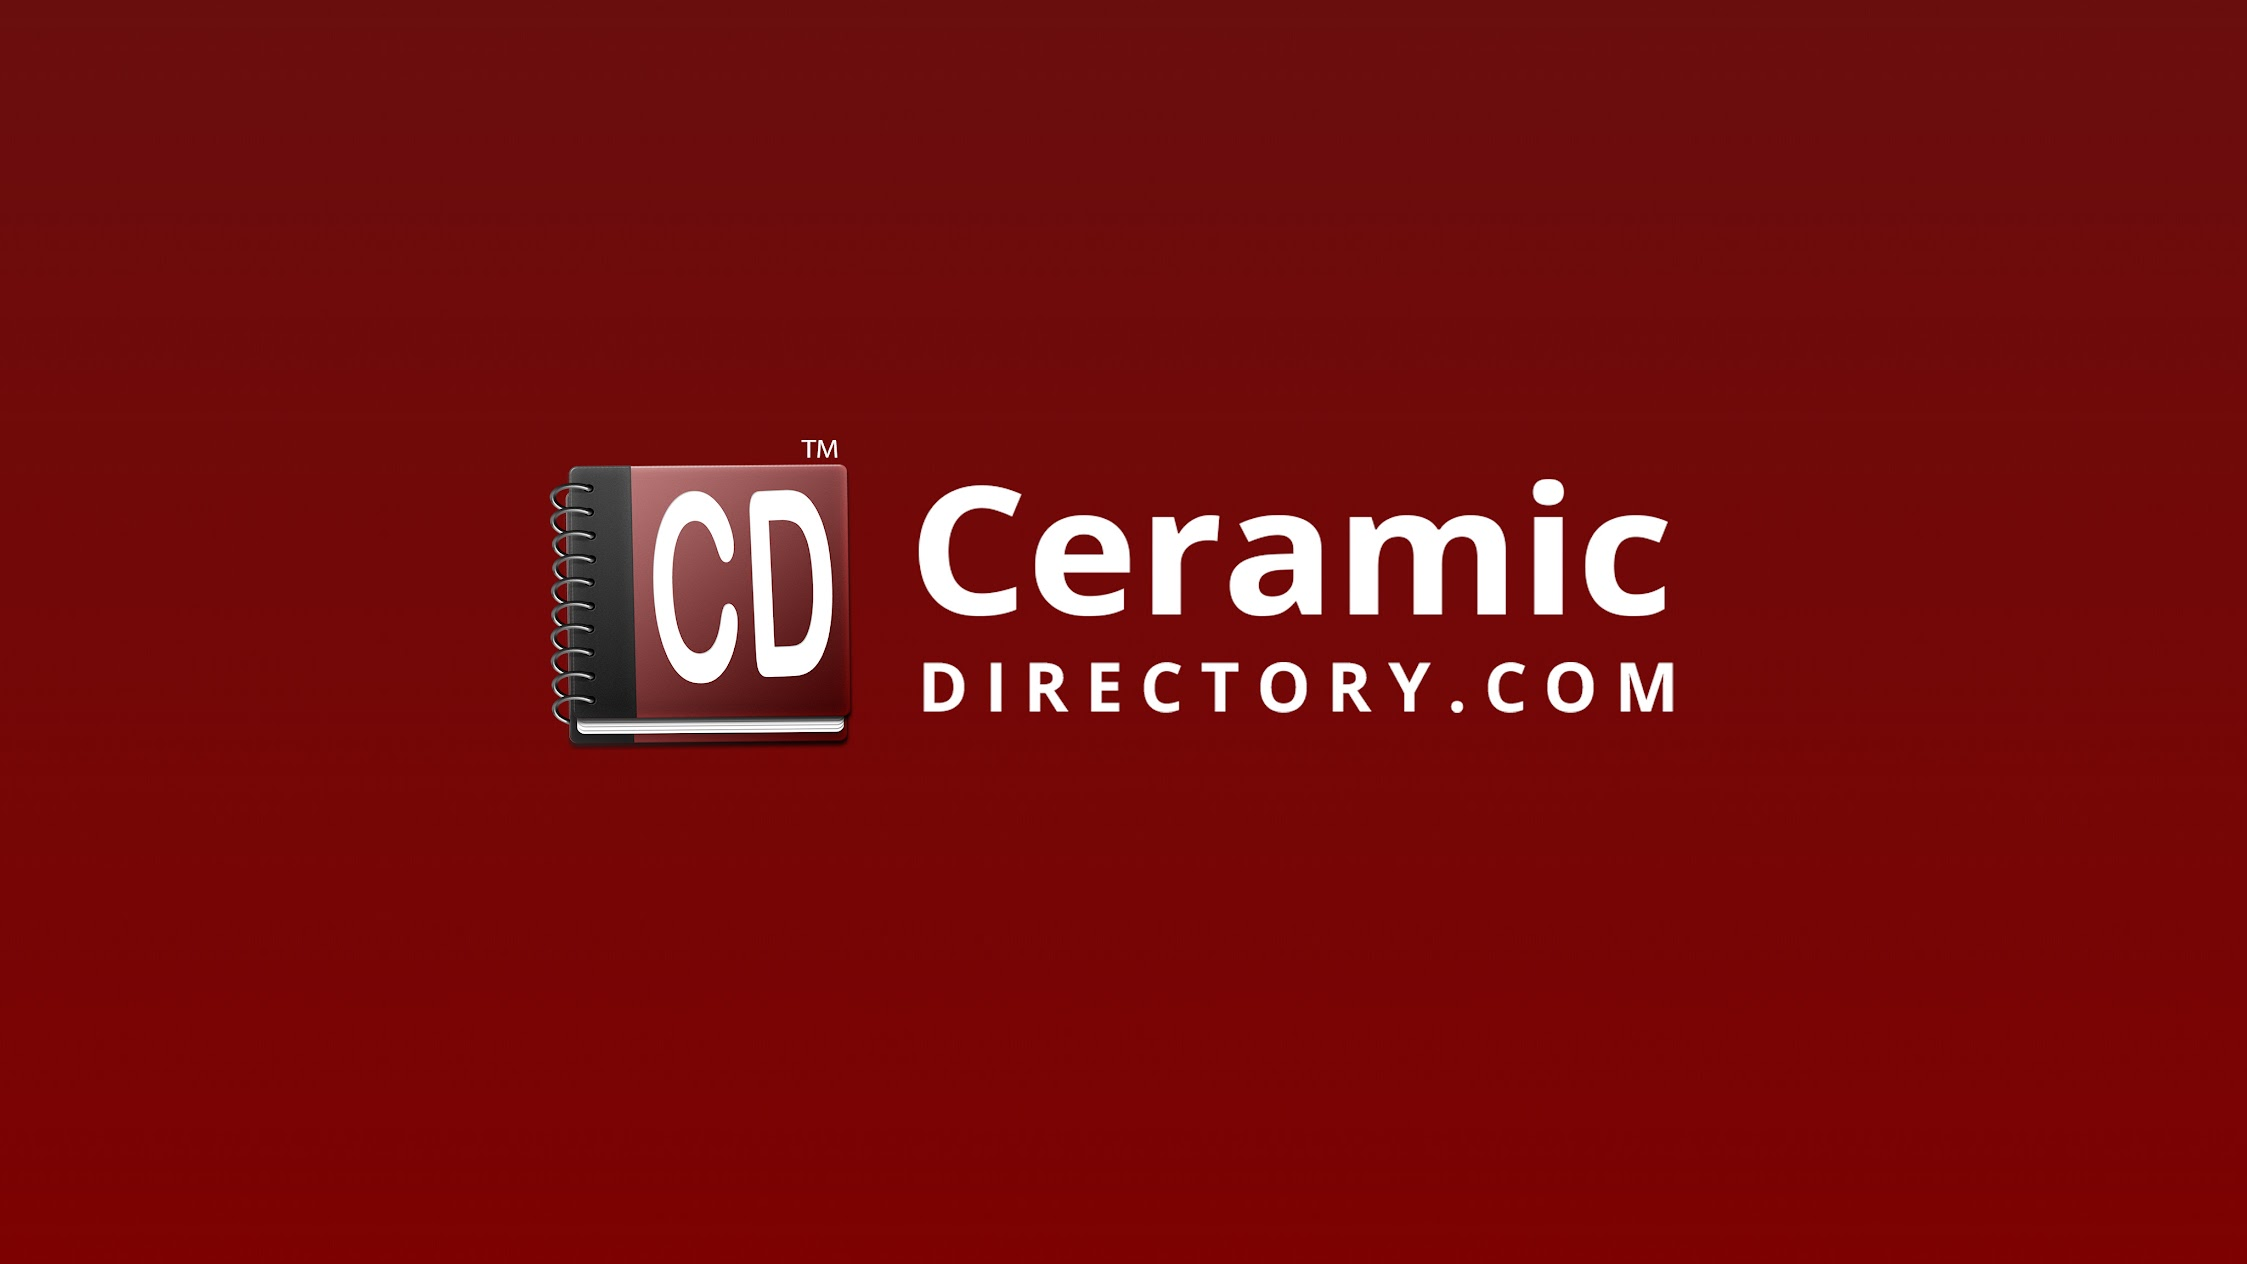 ceramicdirectory.com